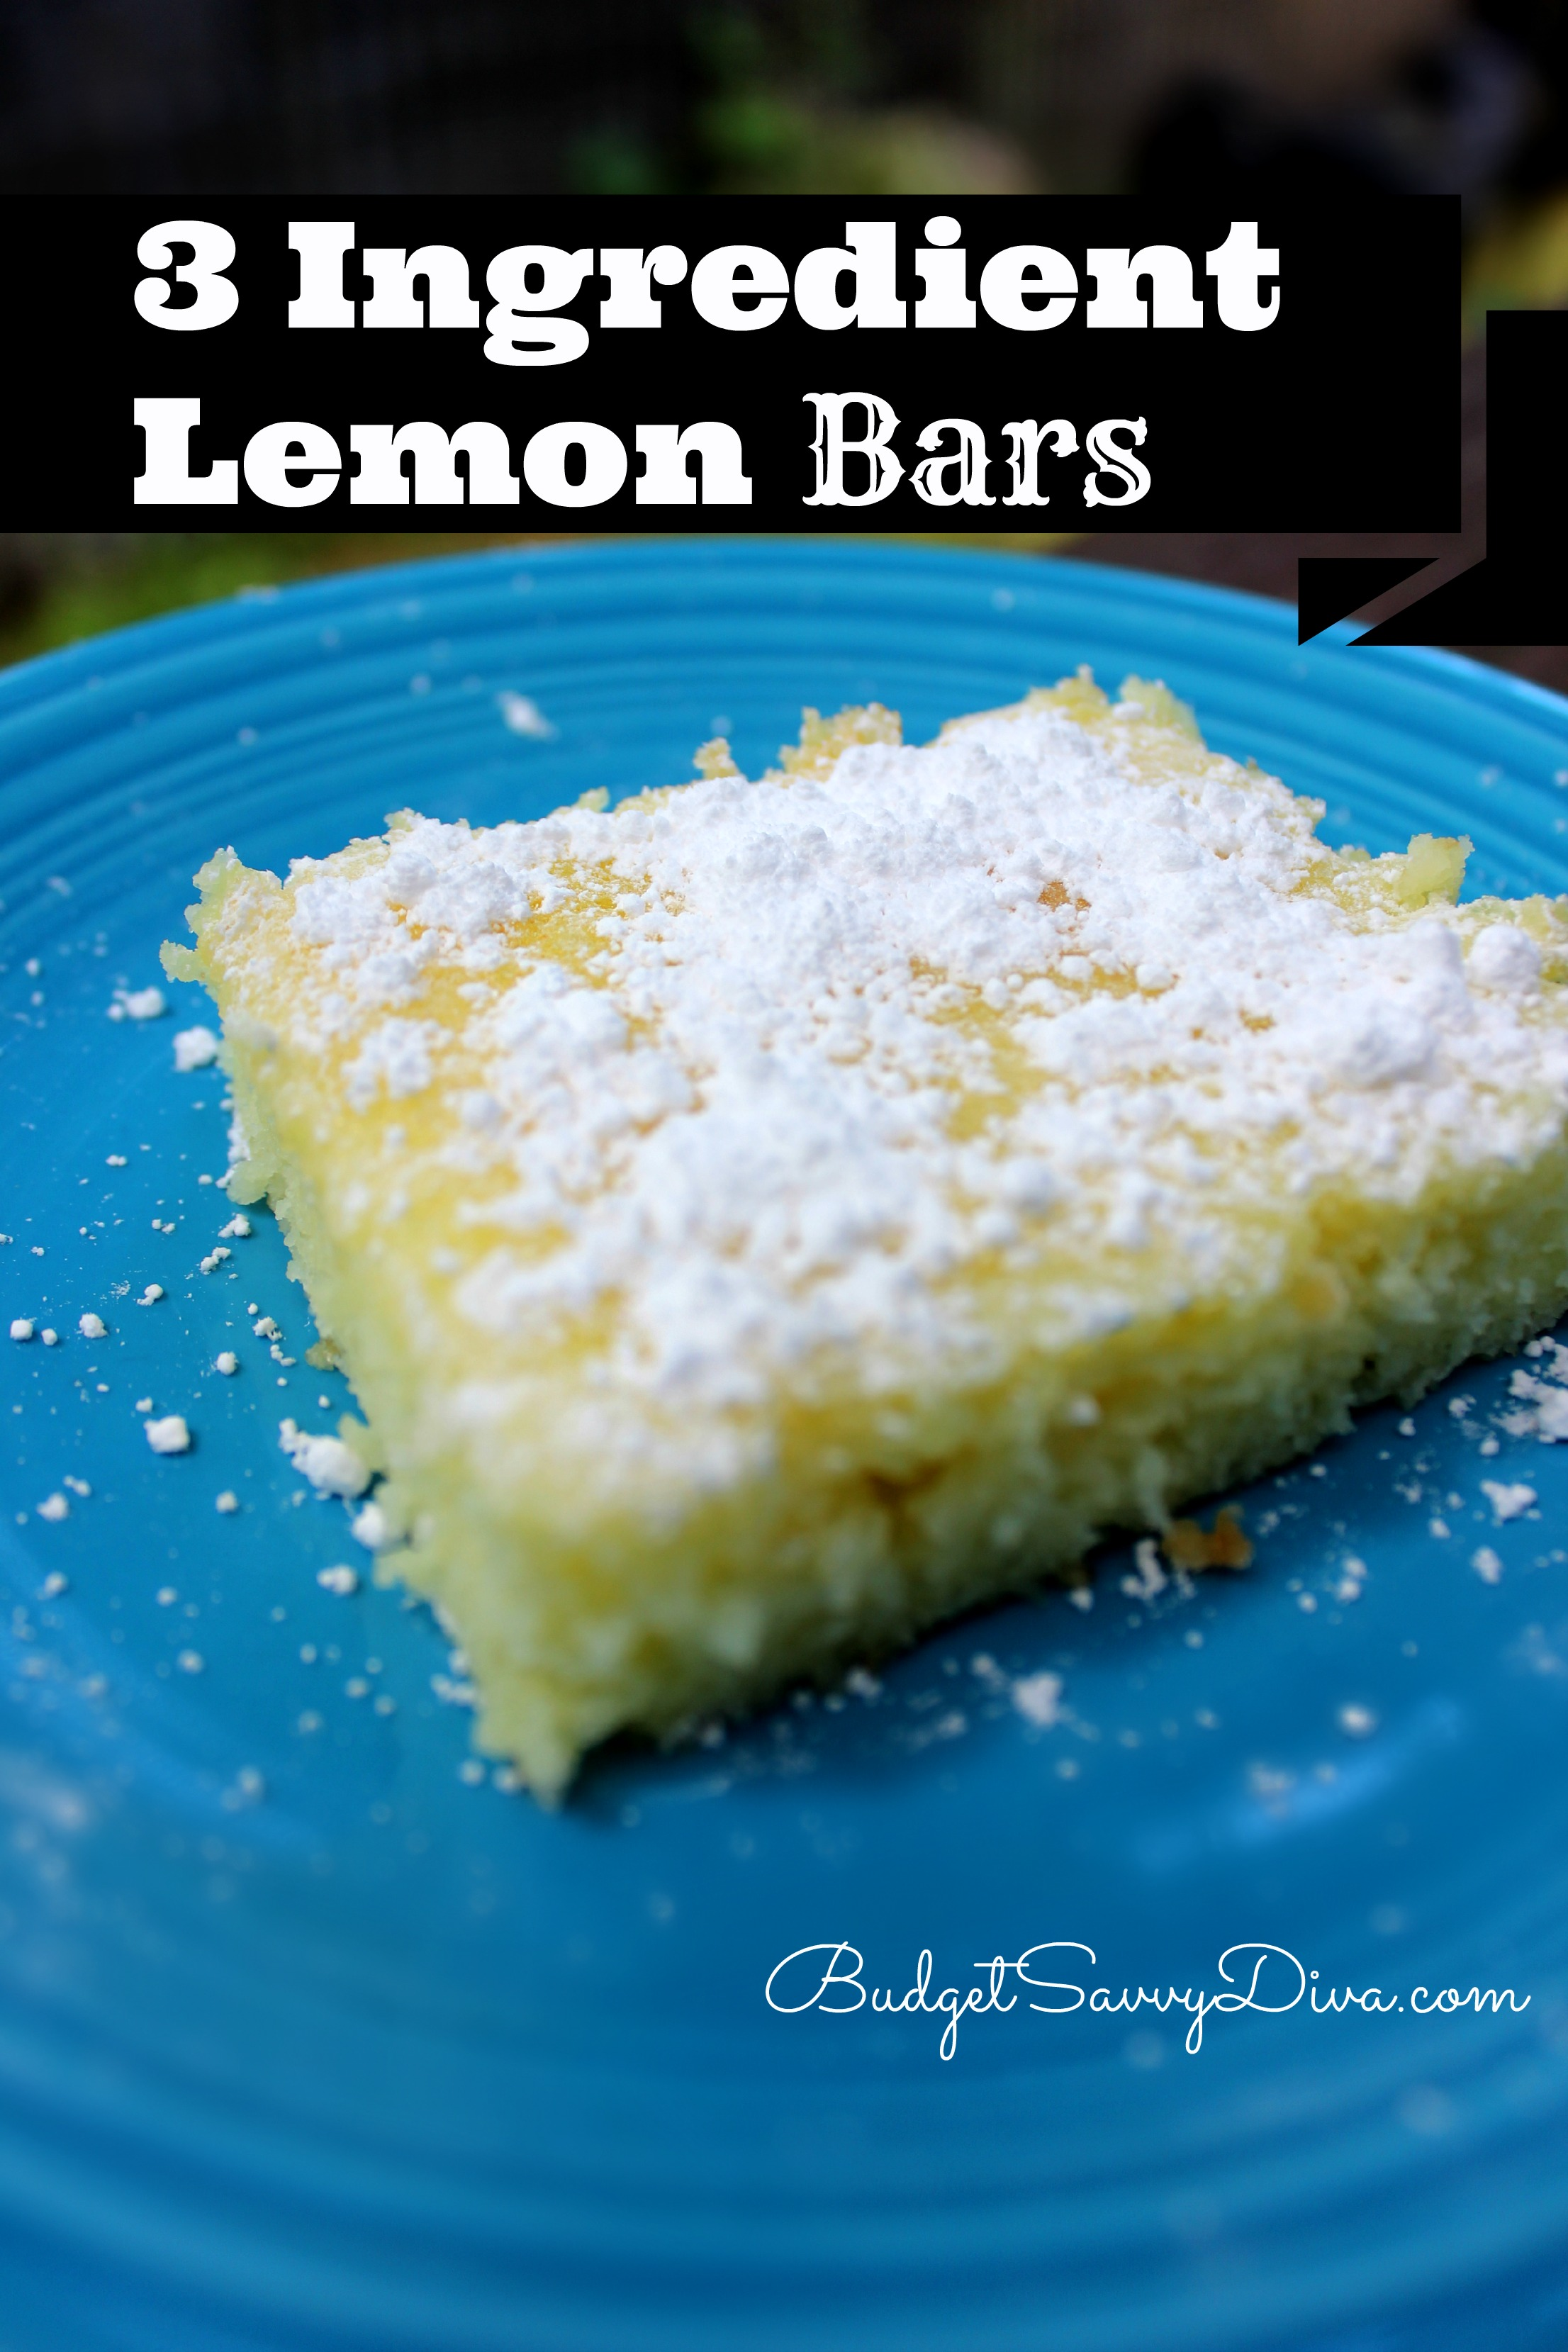 3 Ingredient Lemon Bars Recipe Budget Savvy Diva